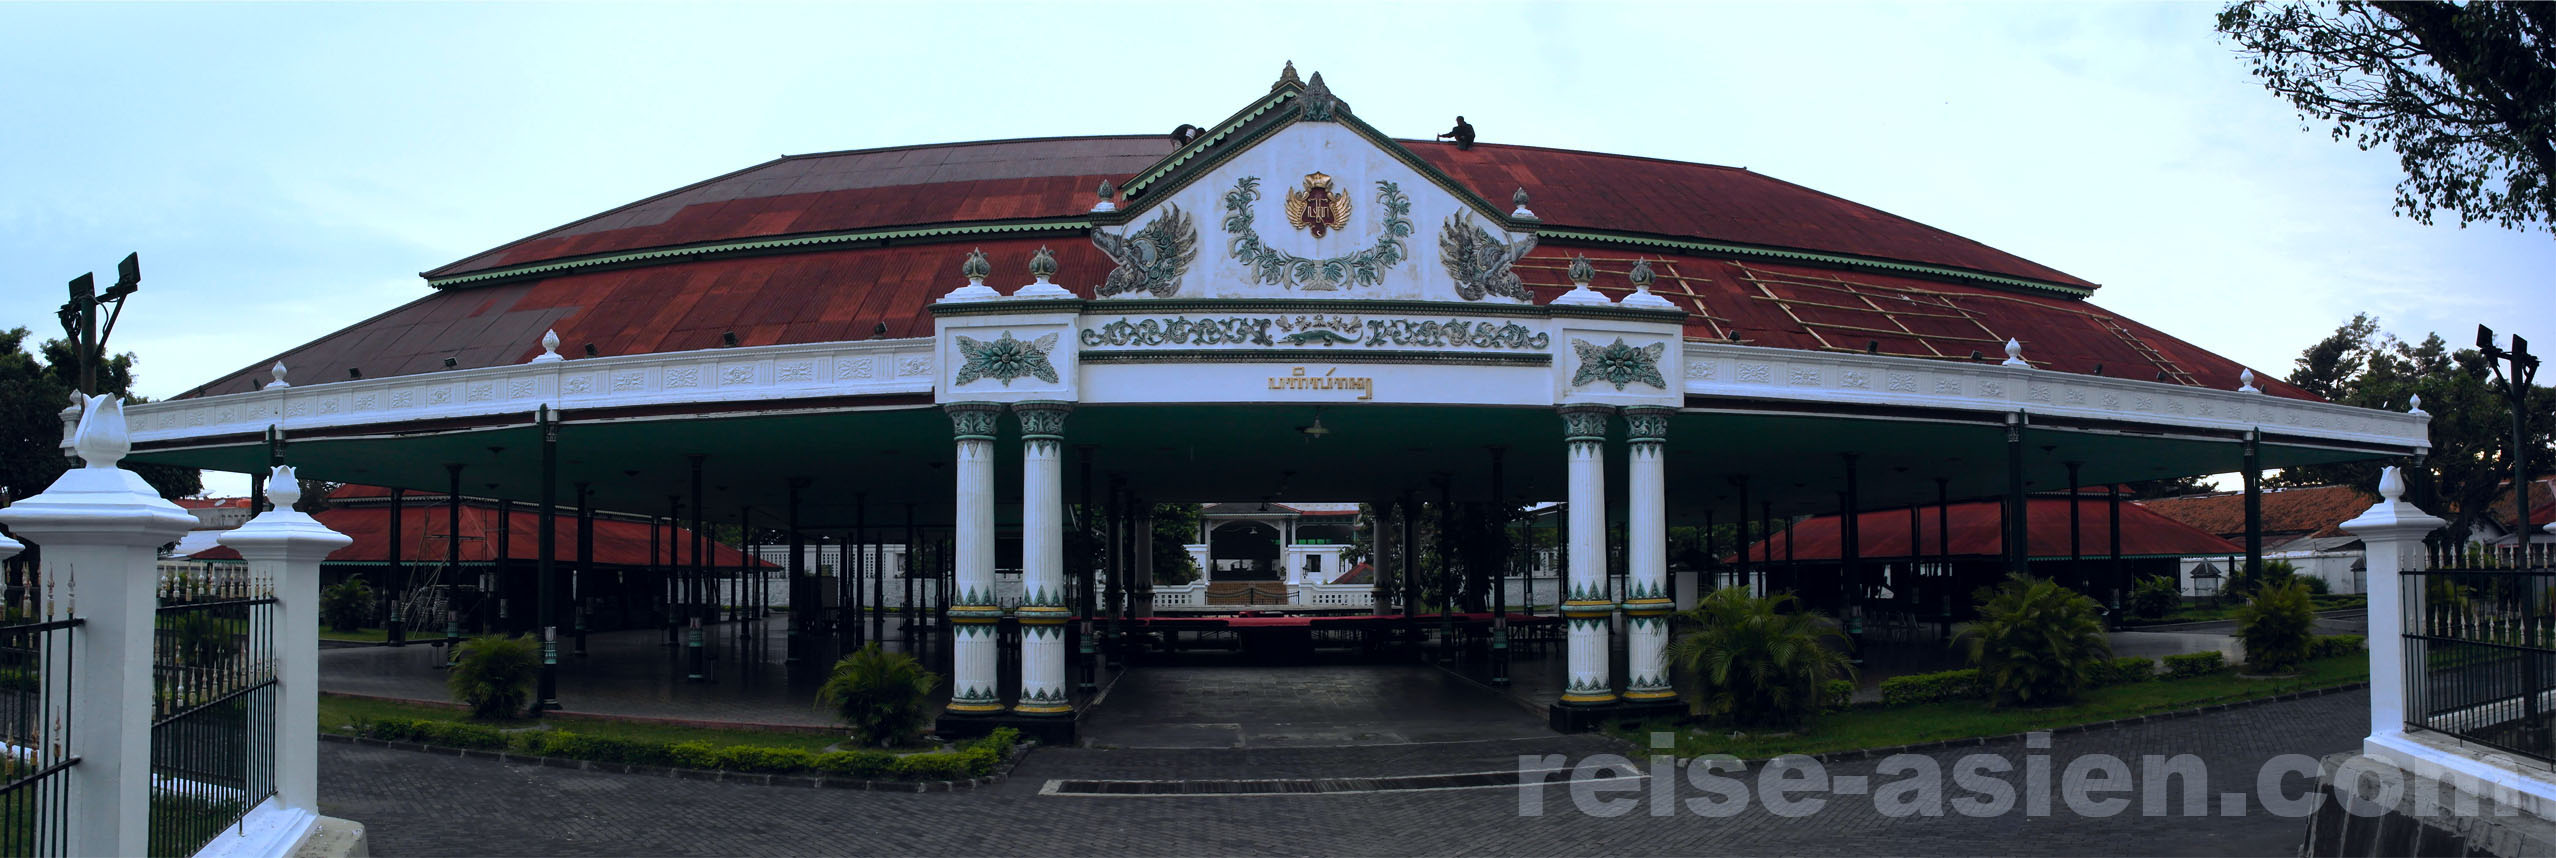 Reisebilder von Yogjakarta